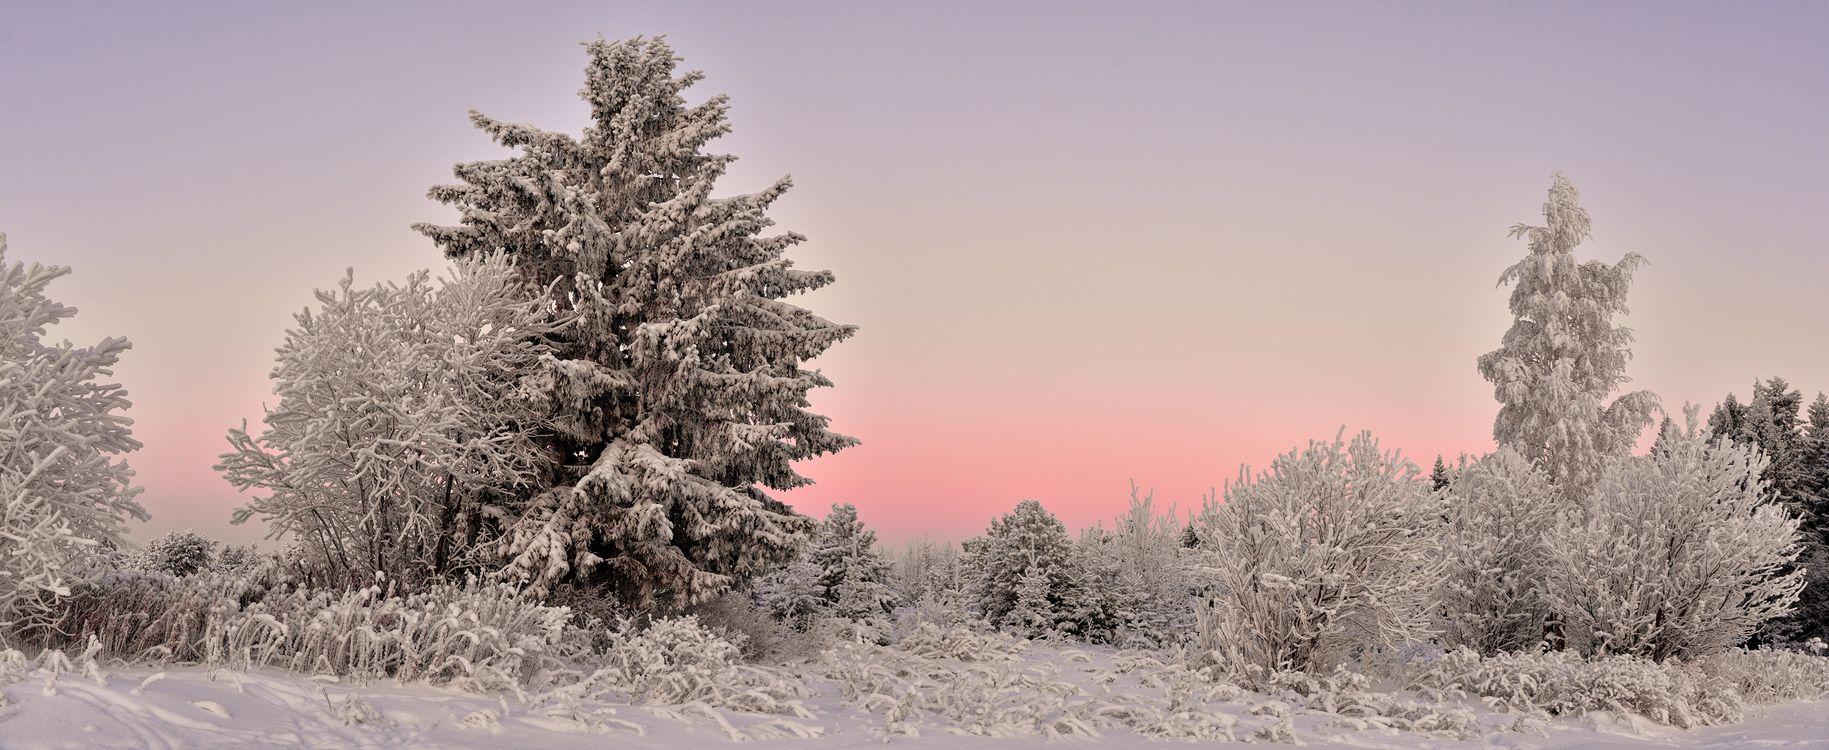 Фото бесплатно панорама, снег, зима - на рабочий стол